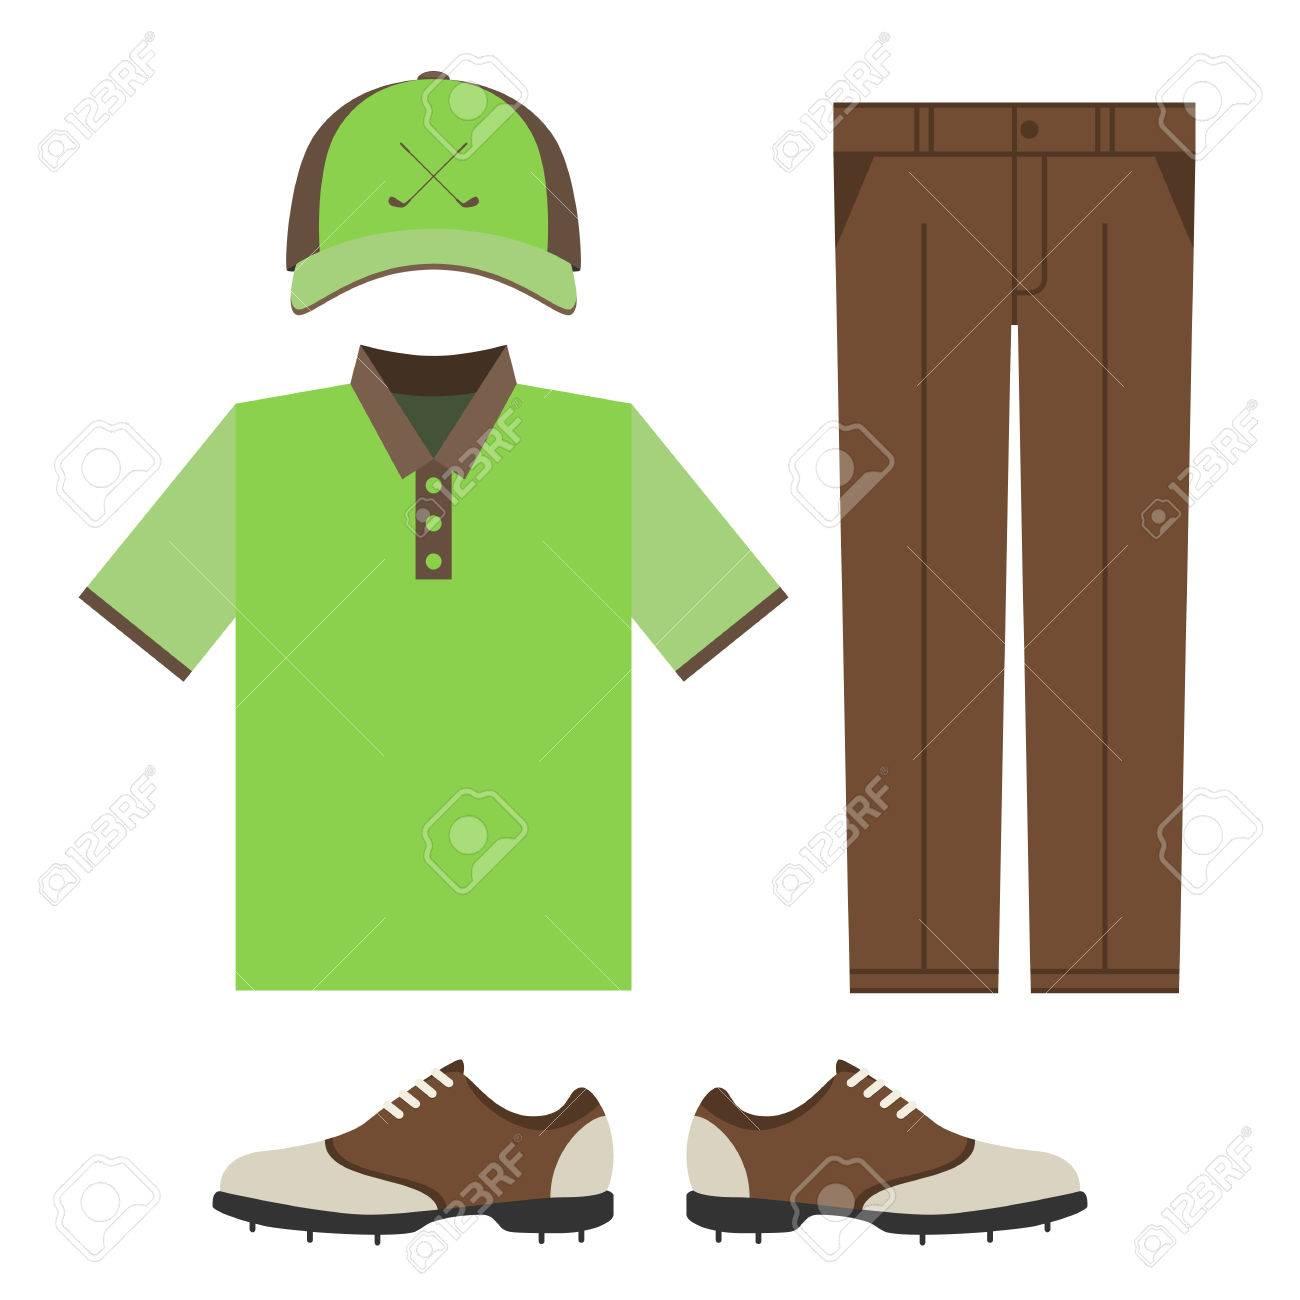 golf colorful clothes set polo t shirt cap pants and shoes rh 123rf com Jeans Clip Art Blank Shirts and Pants Clip Art